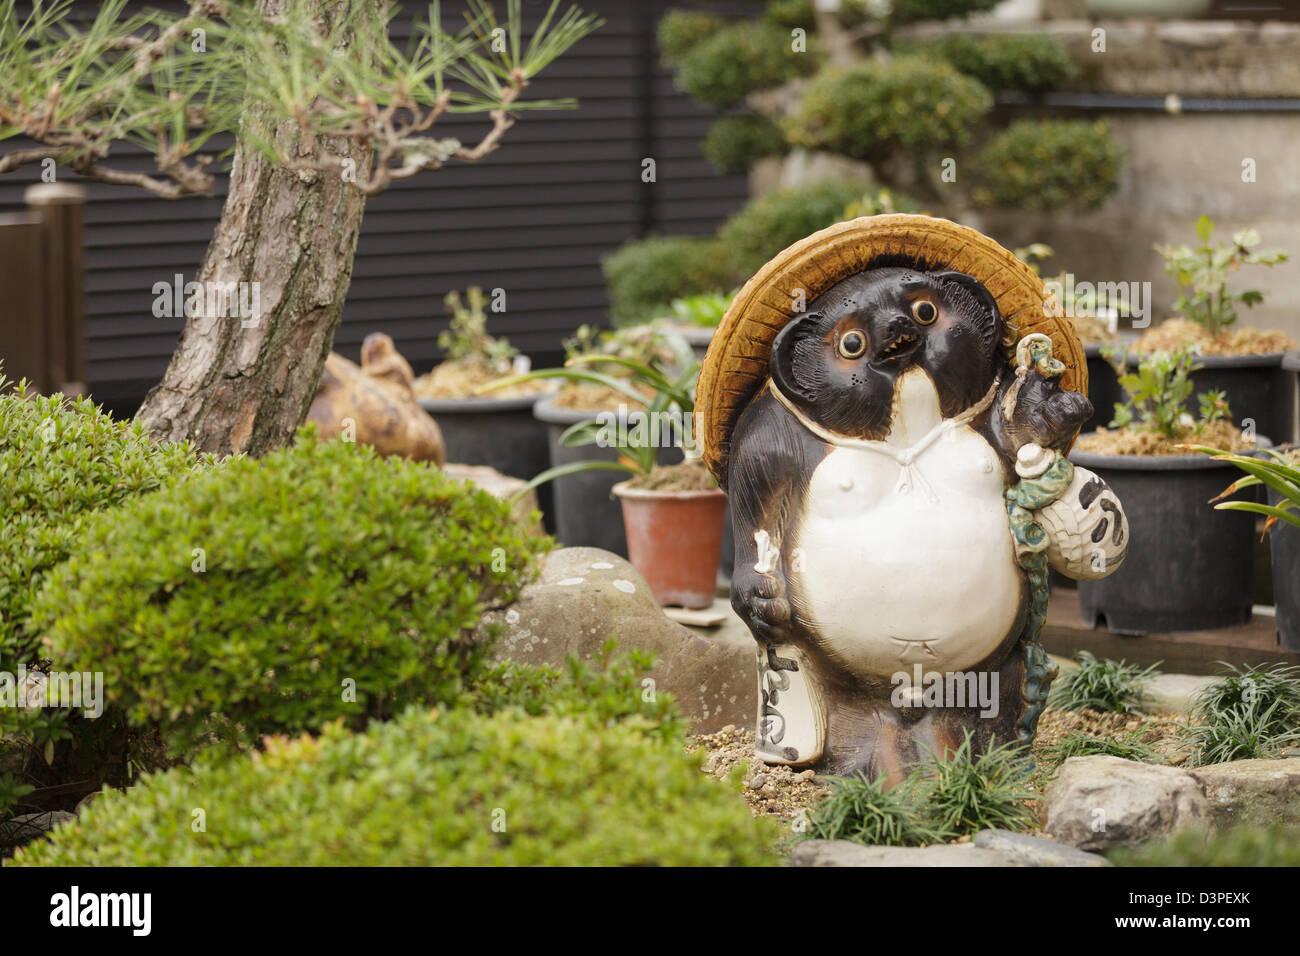 Japanese Garden Statue Of Tanuki The Raccoon Dog Animal Kyoto - Japanese garden ornaments